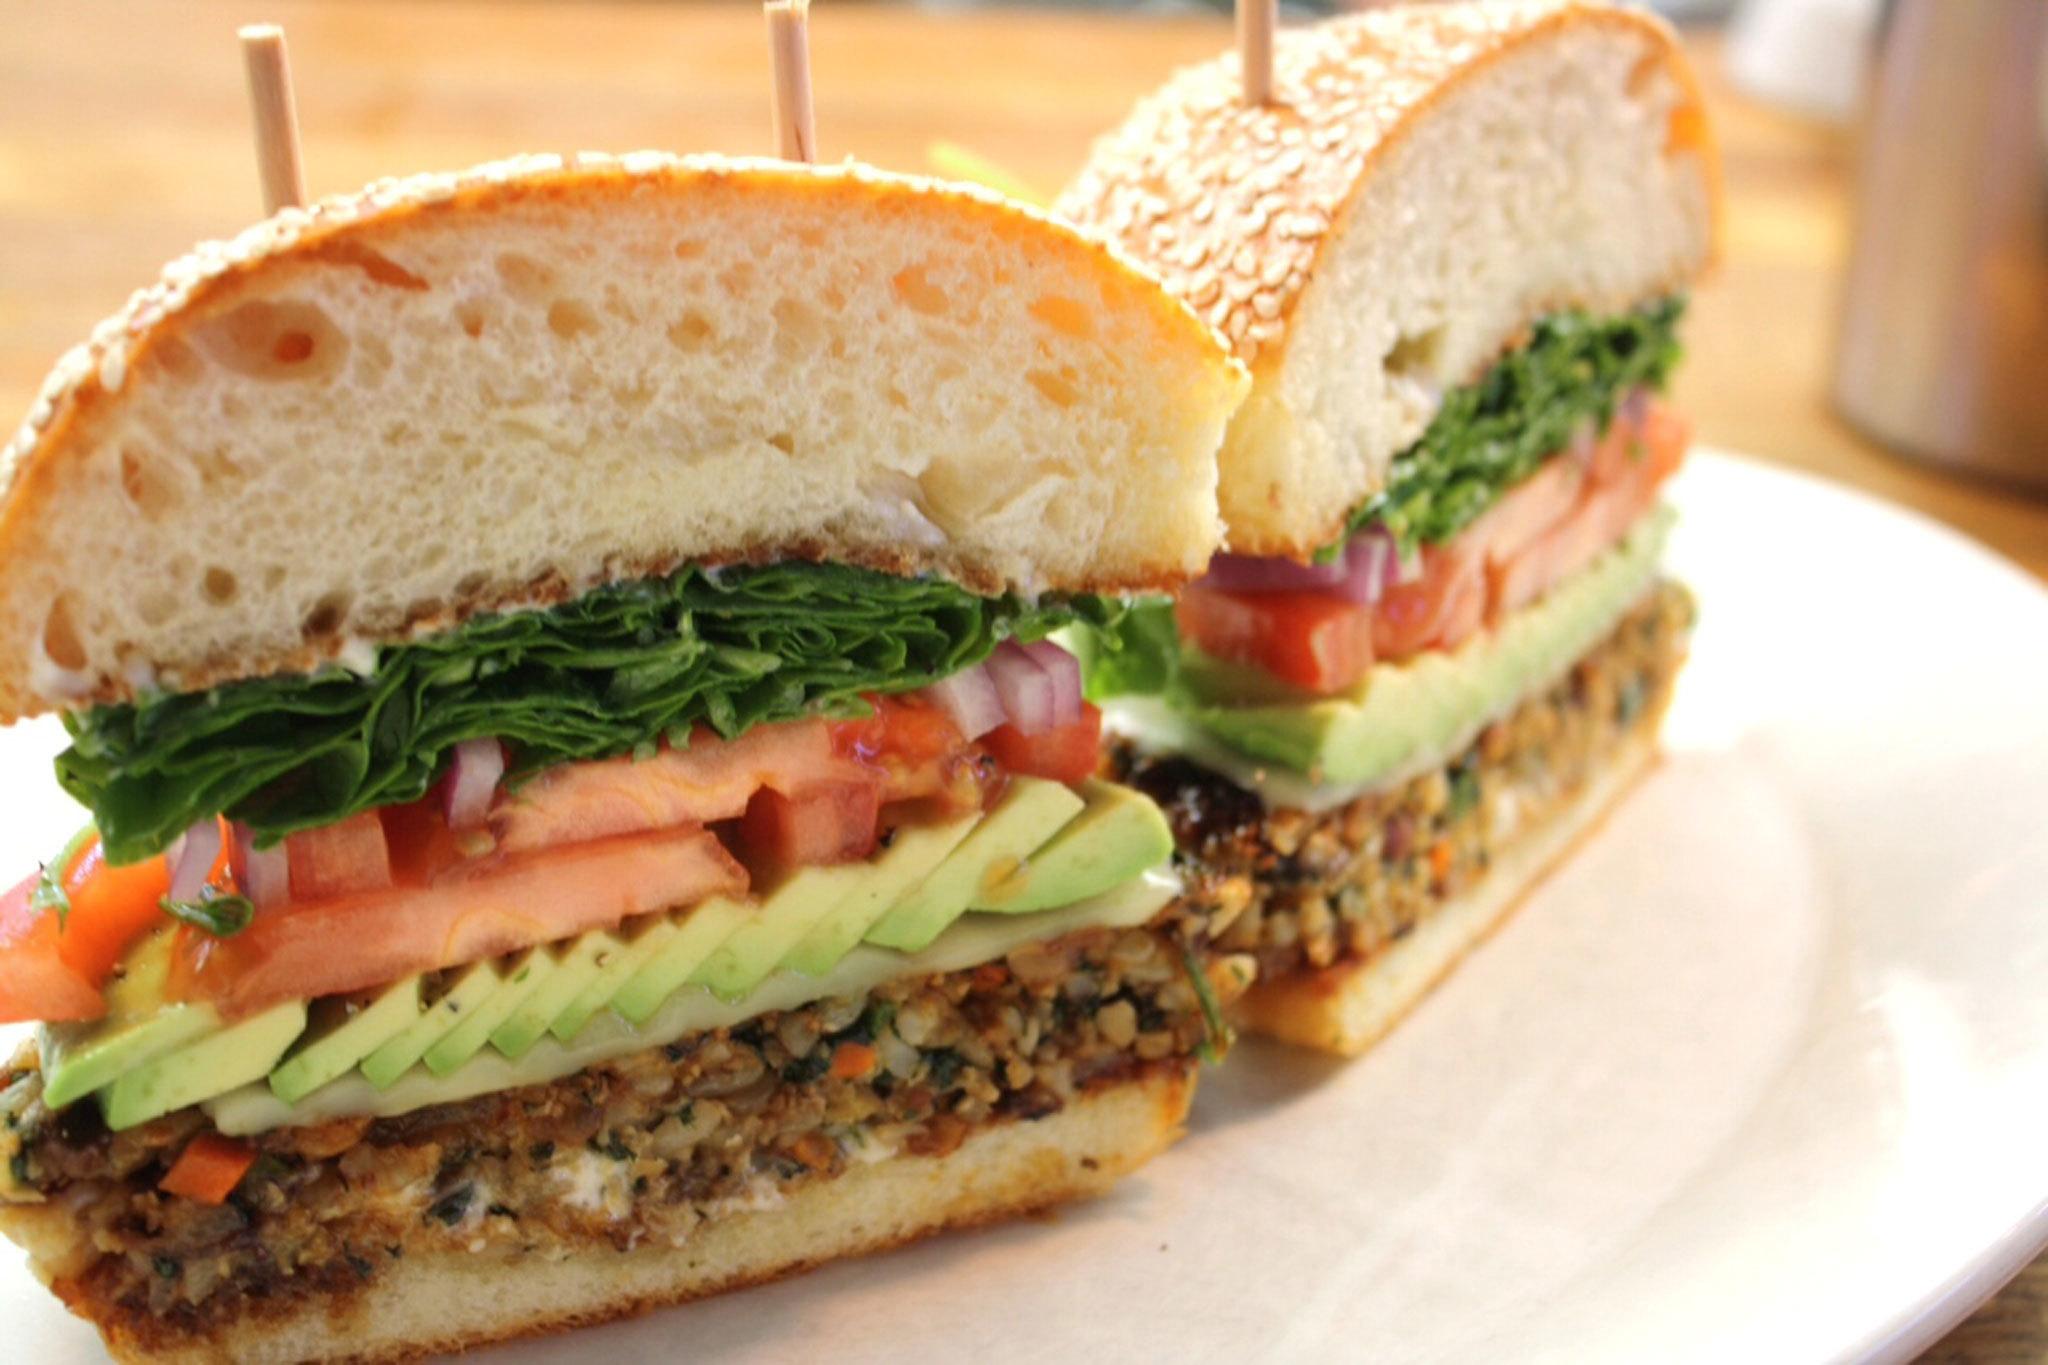 Veggie Burger Backgrounds on Wallpapers Vista